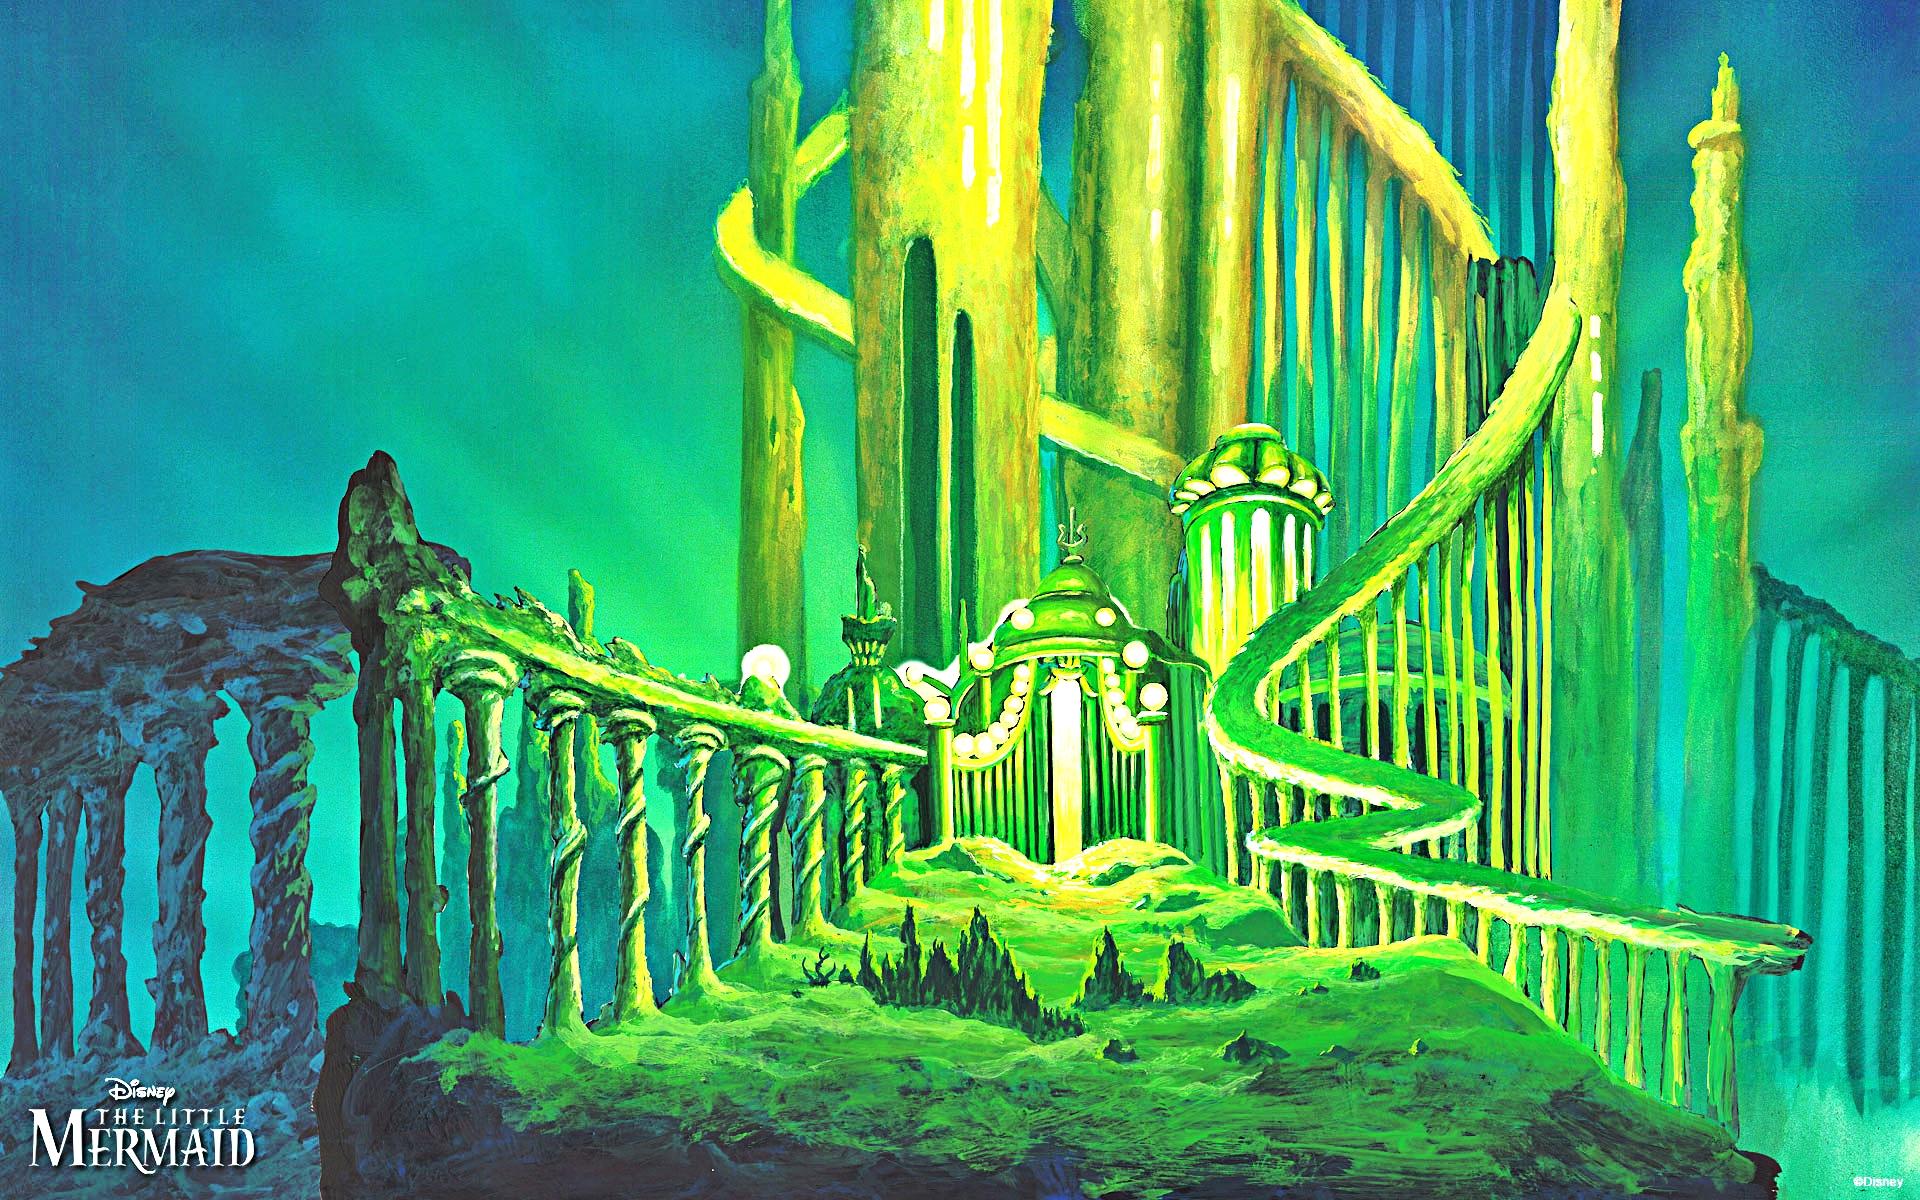 Walt Disney Hintergründe - The Little Mermaid